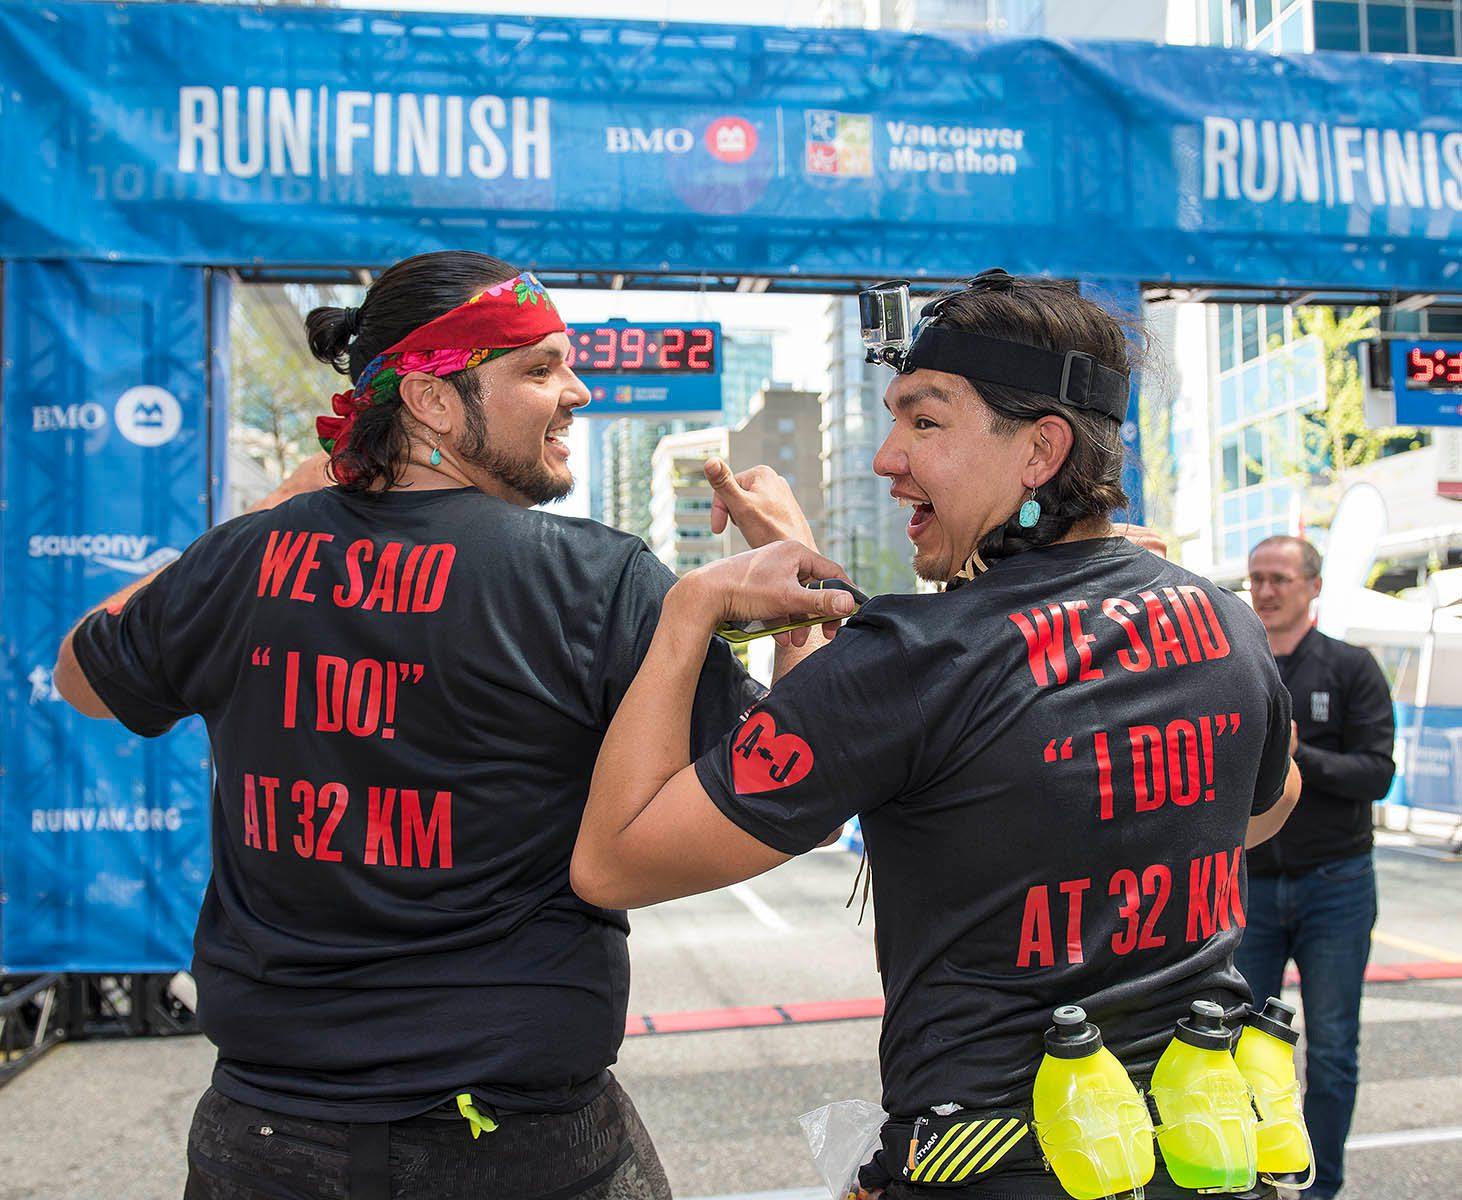 Vancouver Marathon marriage